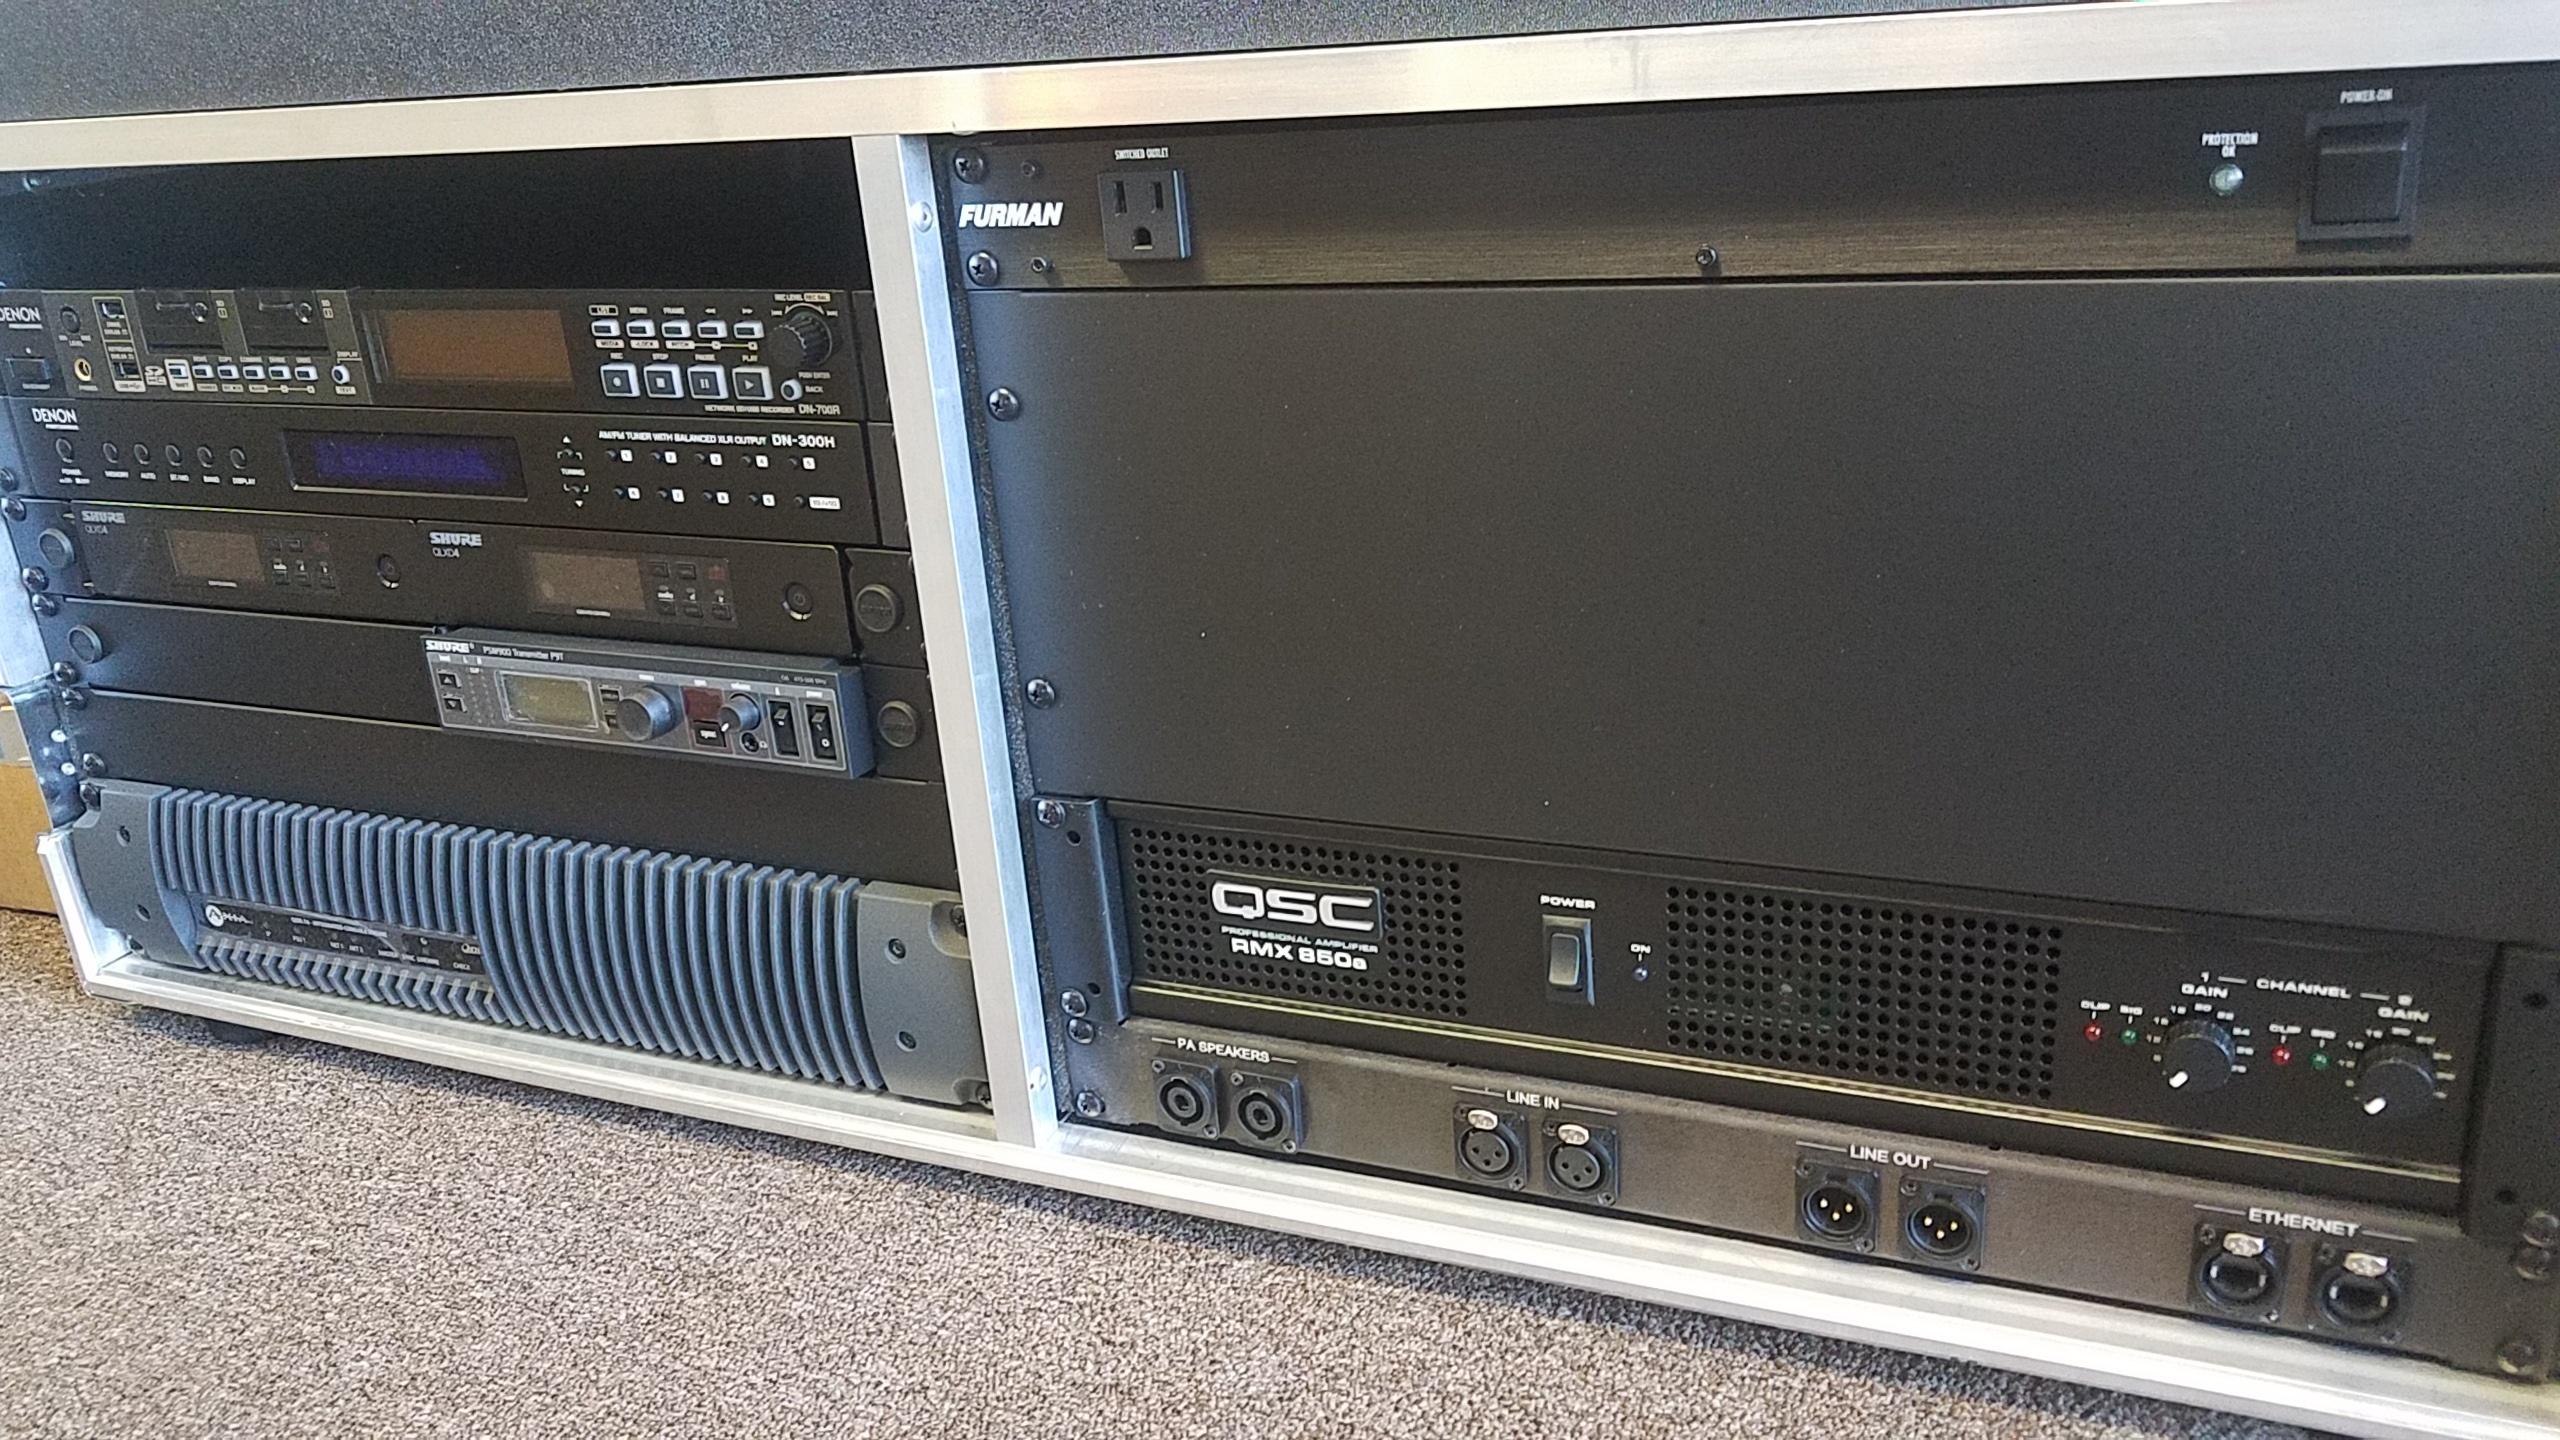 Closeup of remote unit